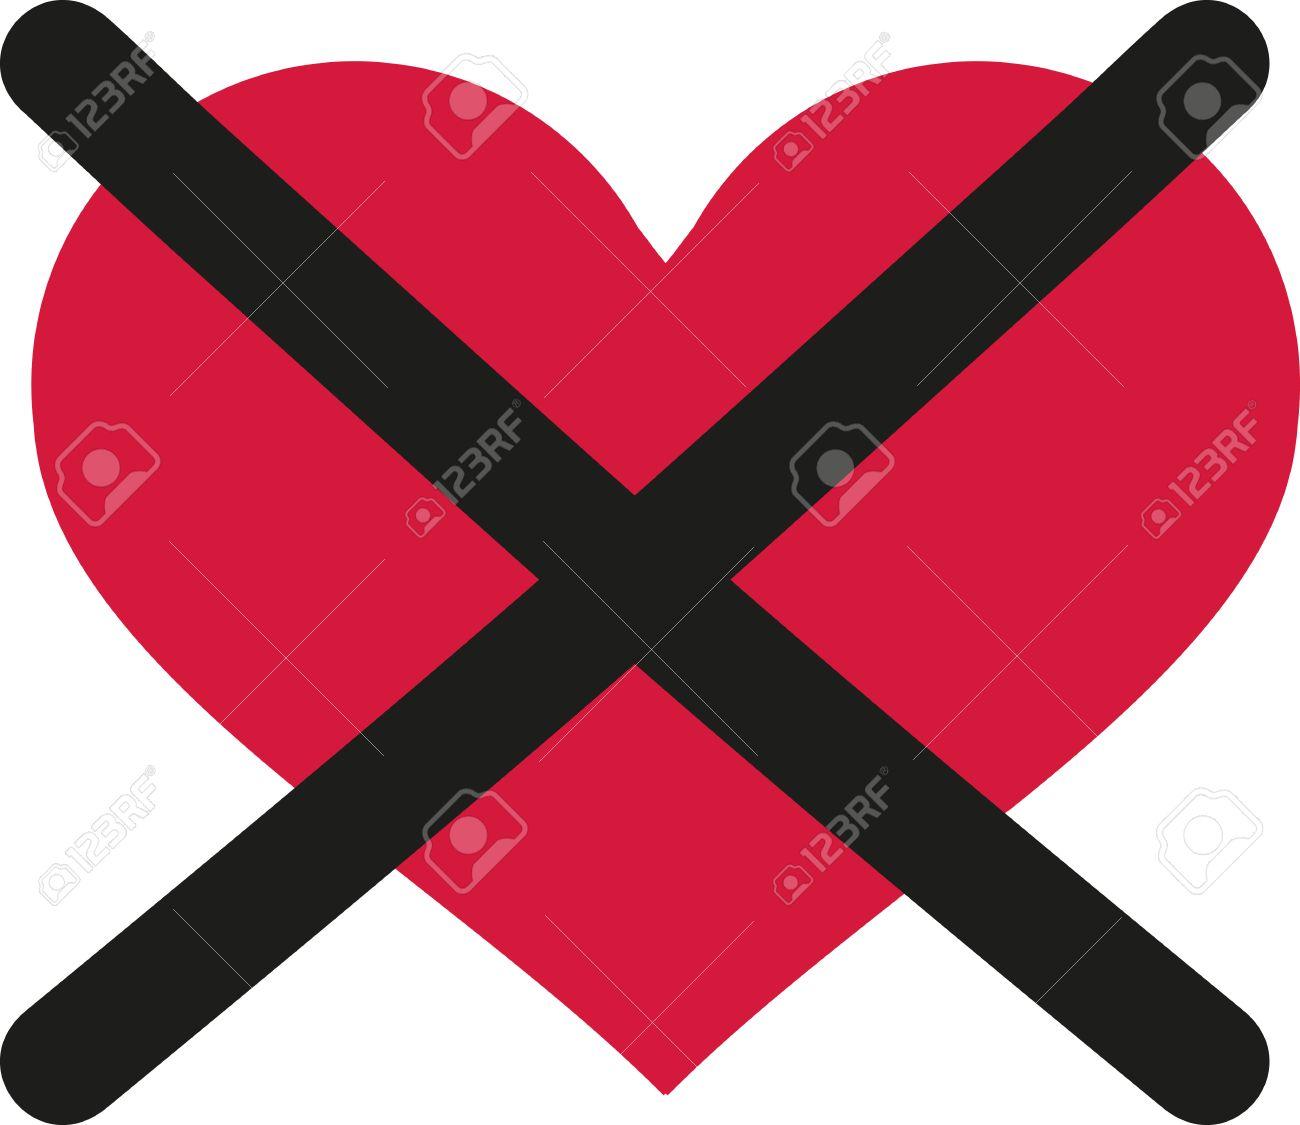 no love heart crossed out royalty free cliparts vectors and rh 123rf com Baseball Bat Vector Logo Baseball Bat Clip Art